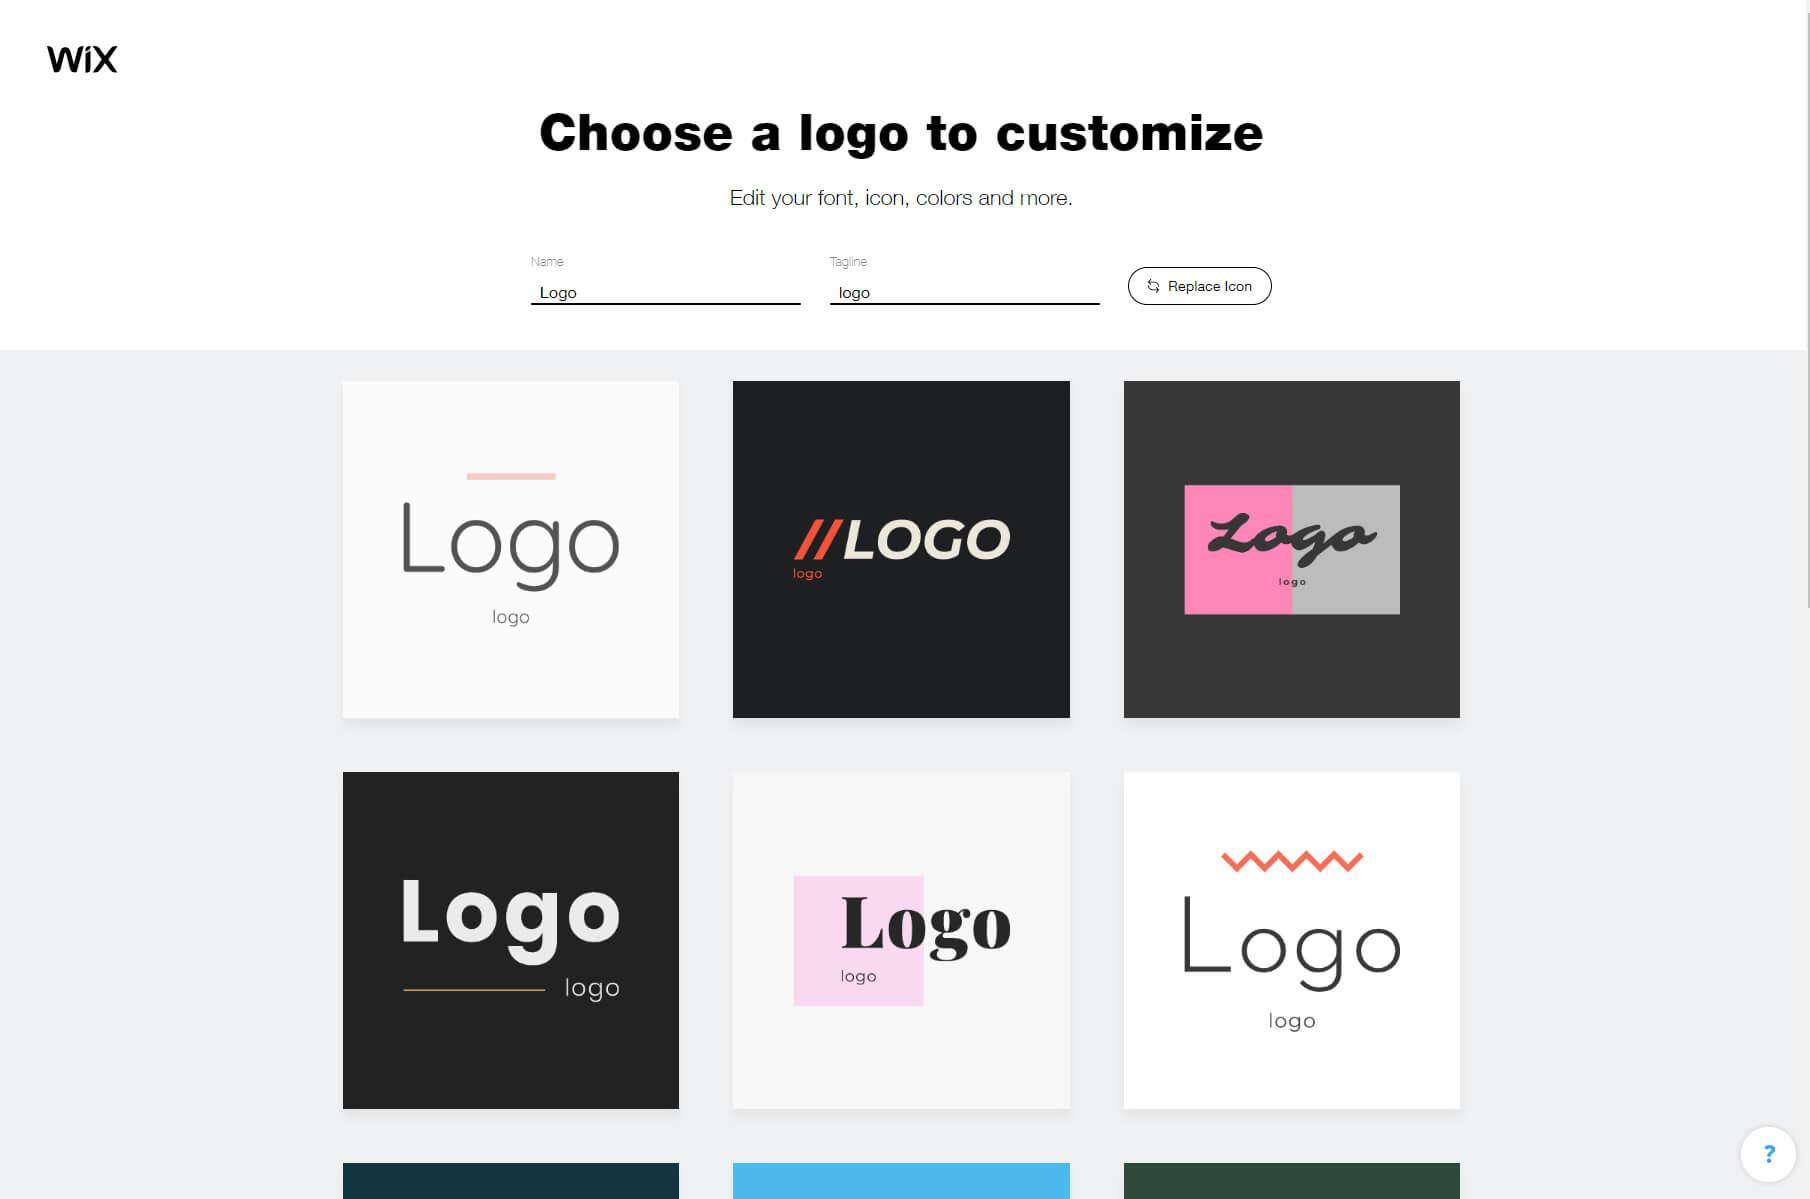 Choose a logo to customize